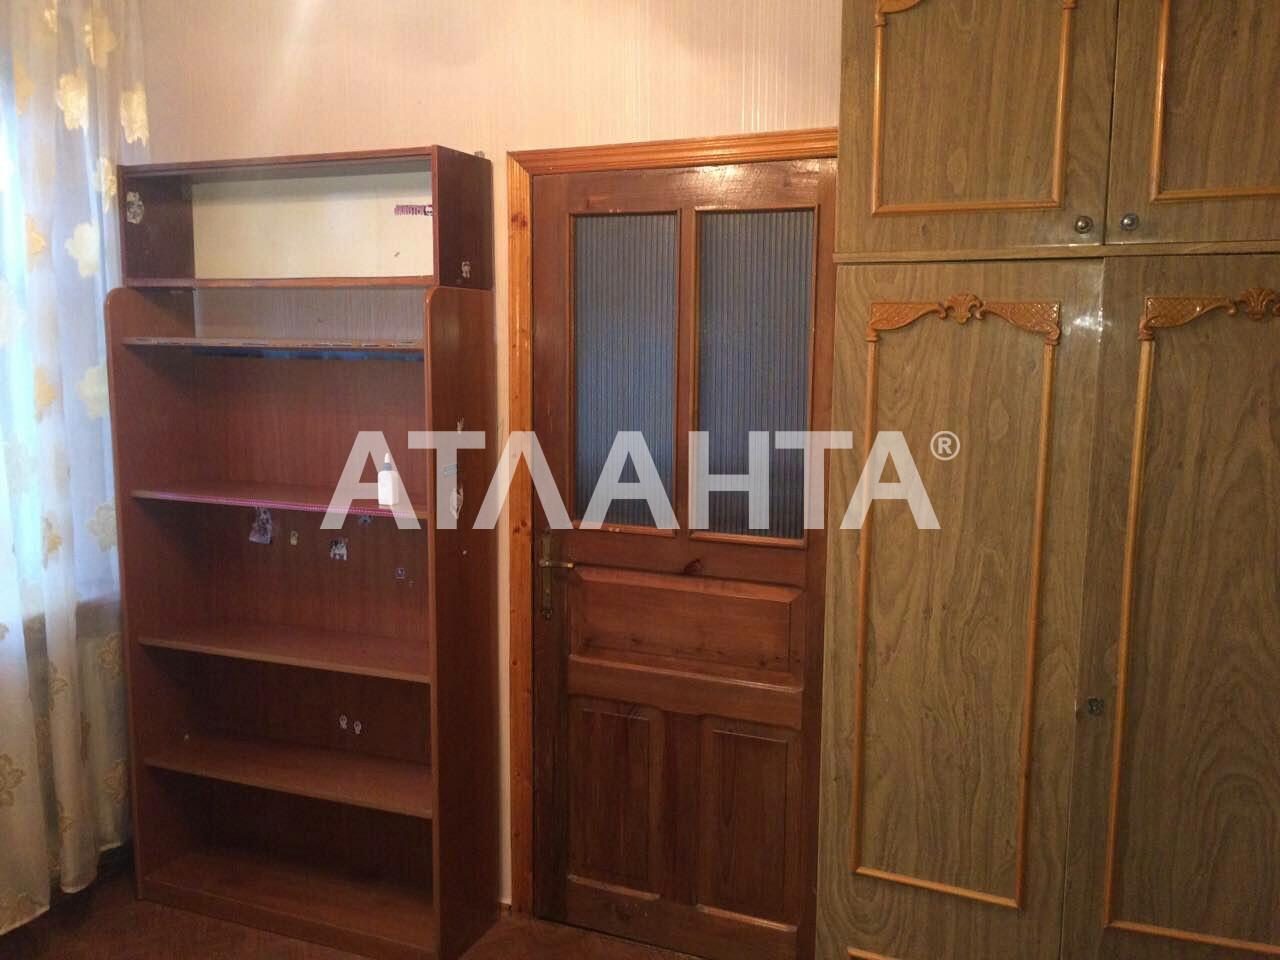 Продается 3-комнатная Квартира на ул. Люстдорфская Дор. 27 — 42 000 у.е. (фото №4)